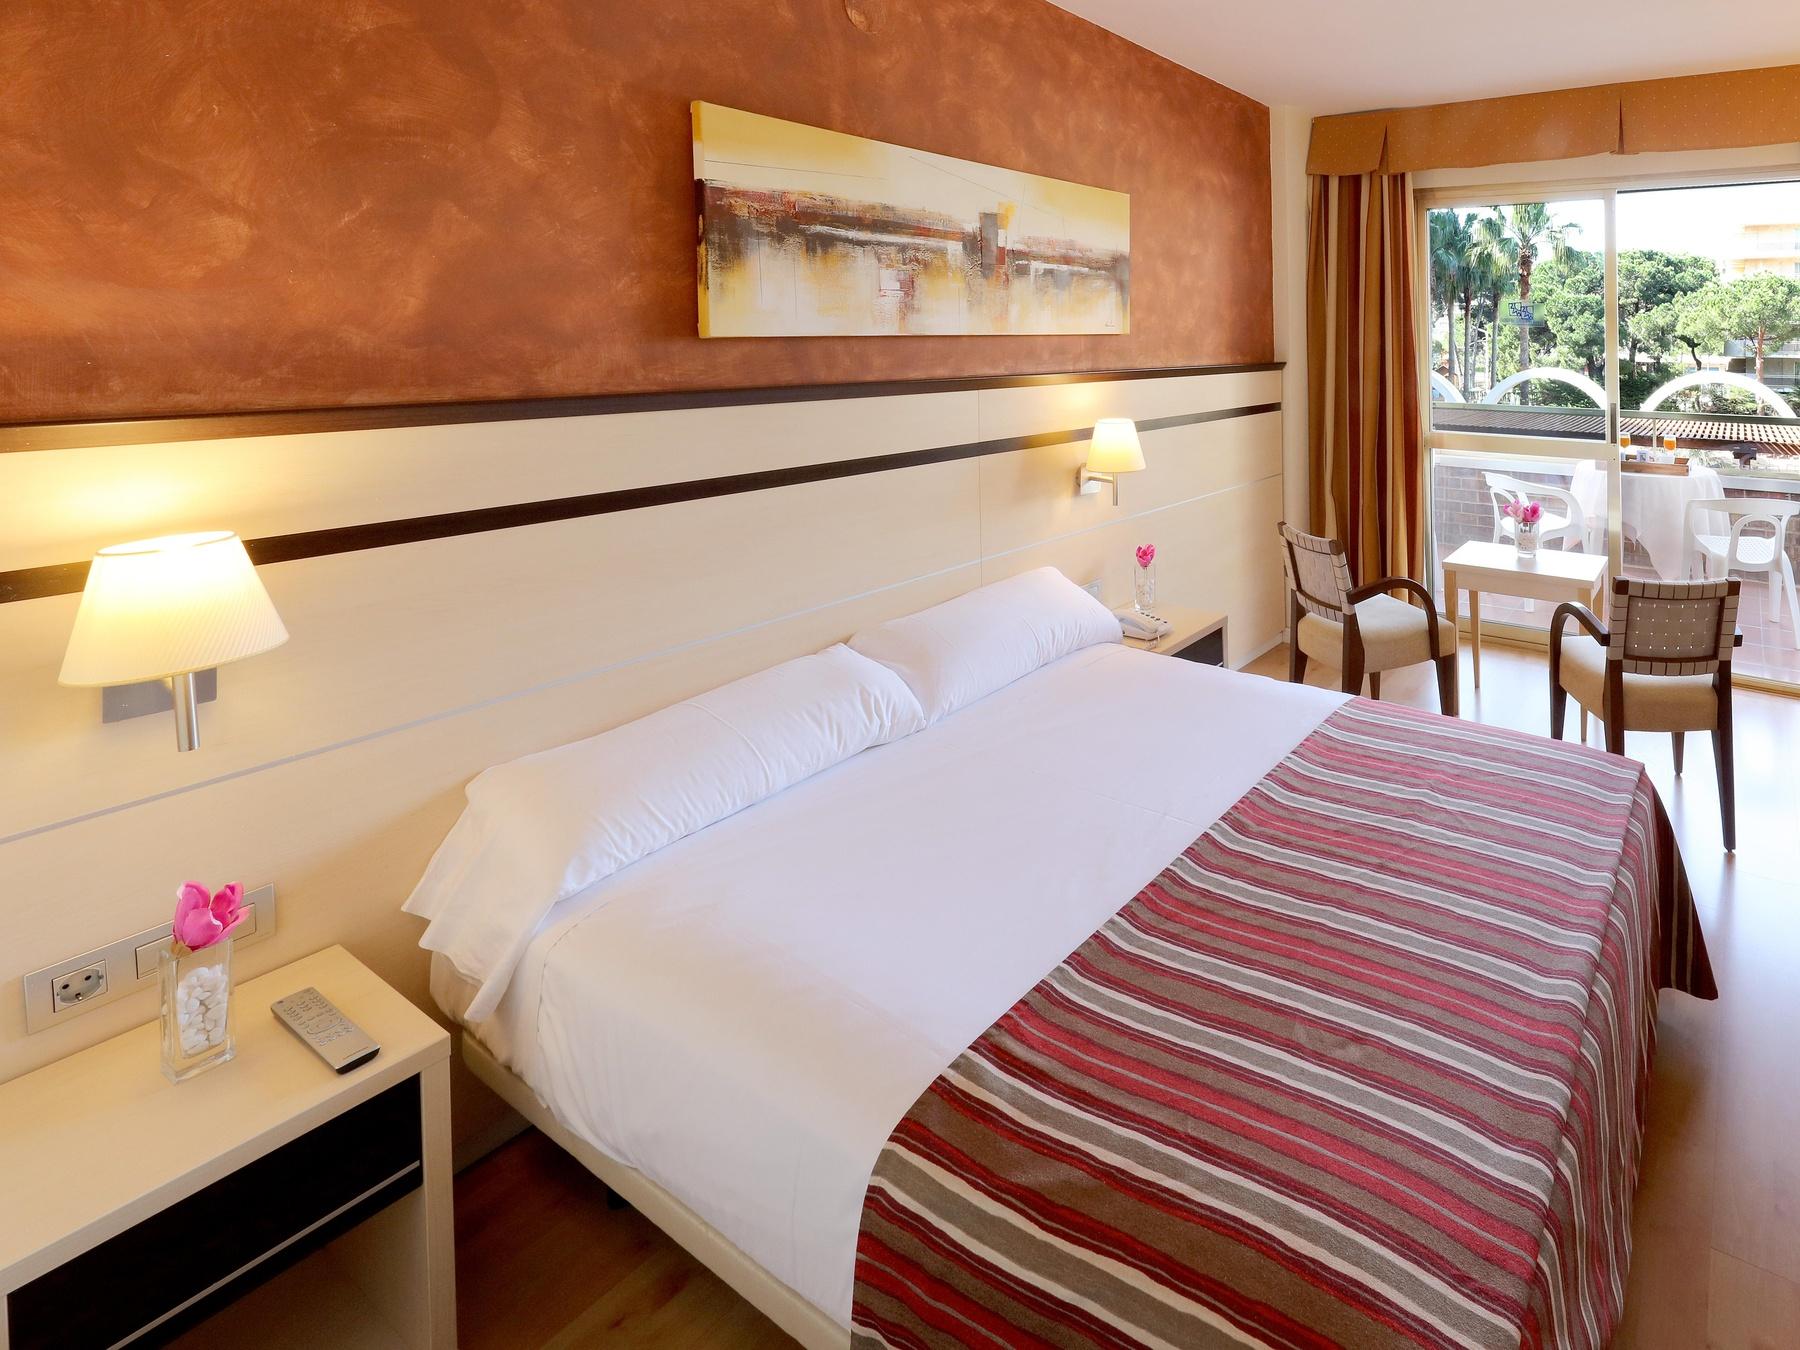 hotel habitacions familiars Salou Costa Dorada